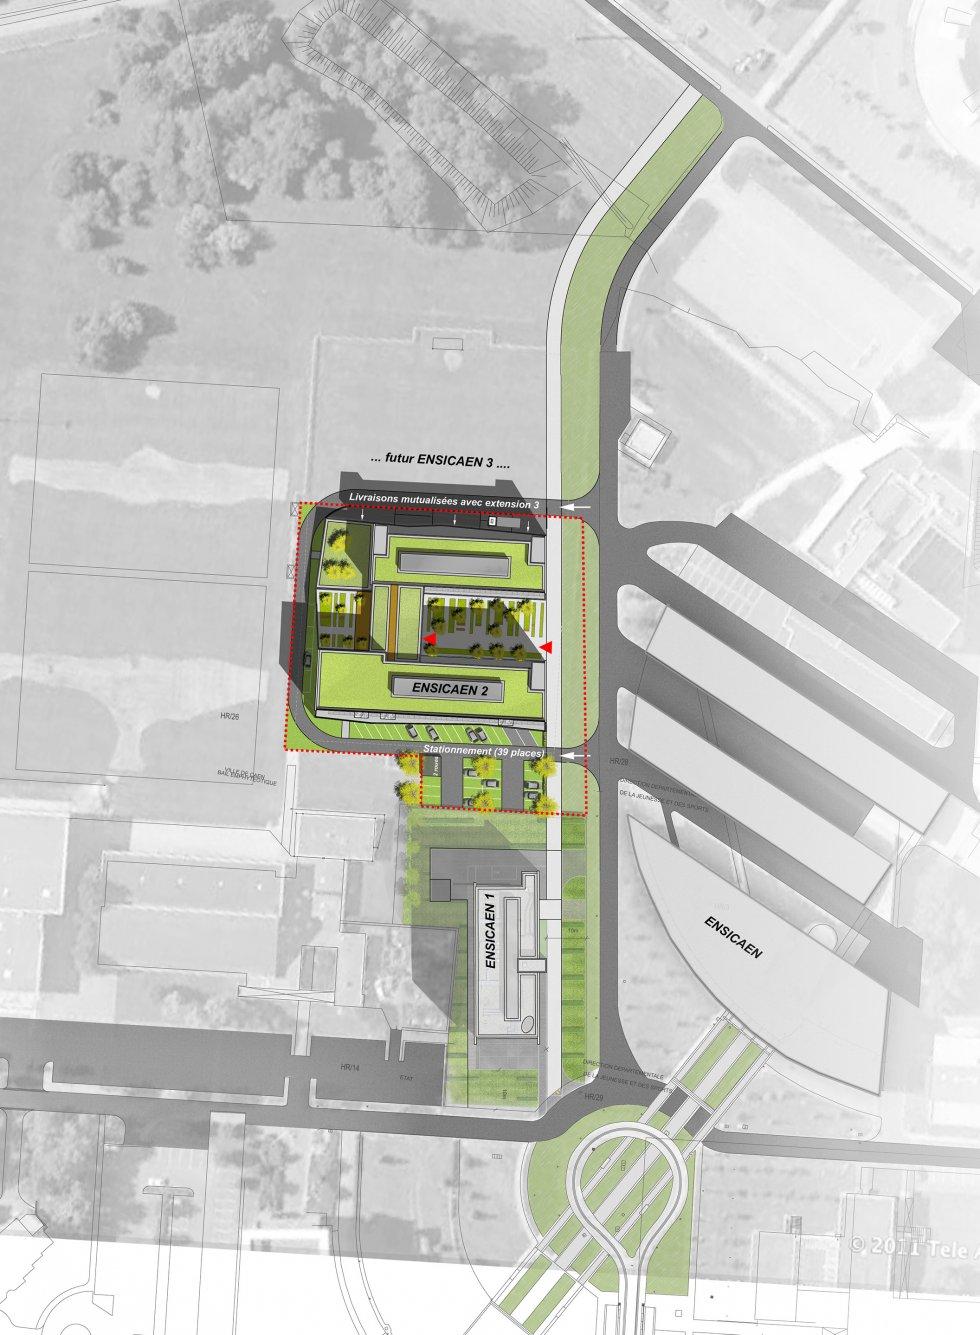 ARVAL architecture - ENSICAEN 2 – Caen-la-mer - 2 Arval Ensicaen 2 Caen